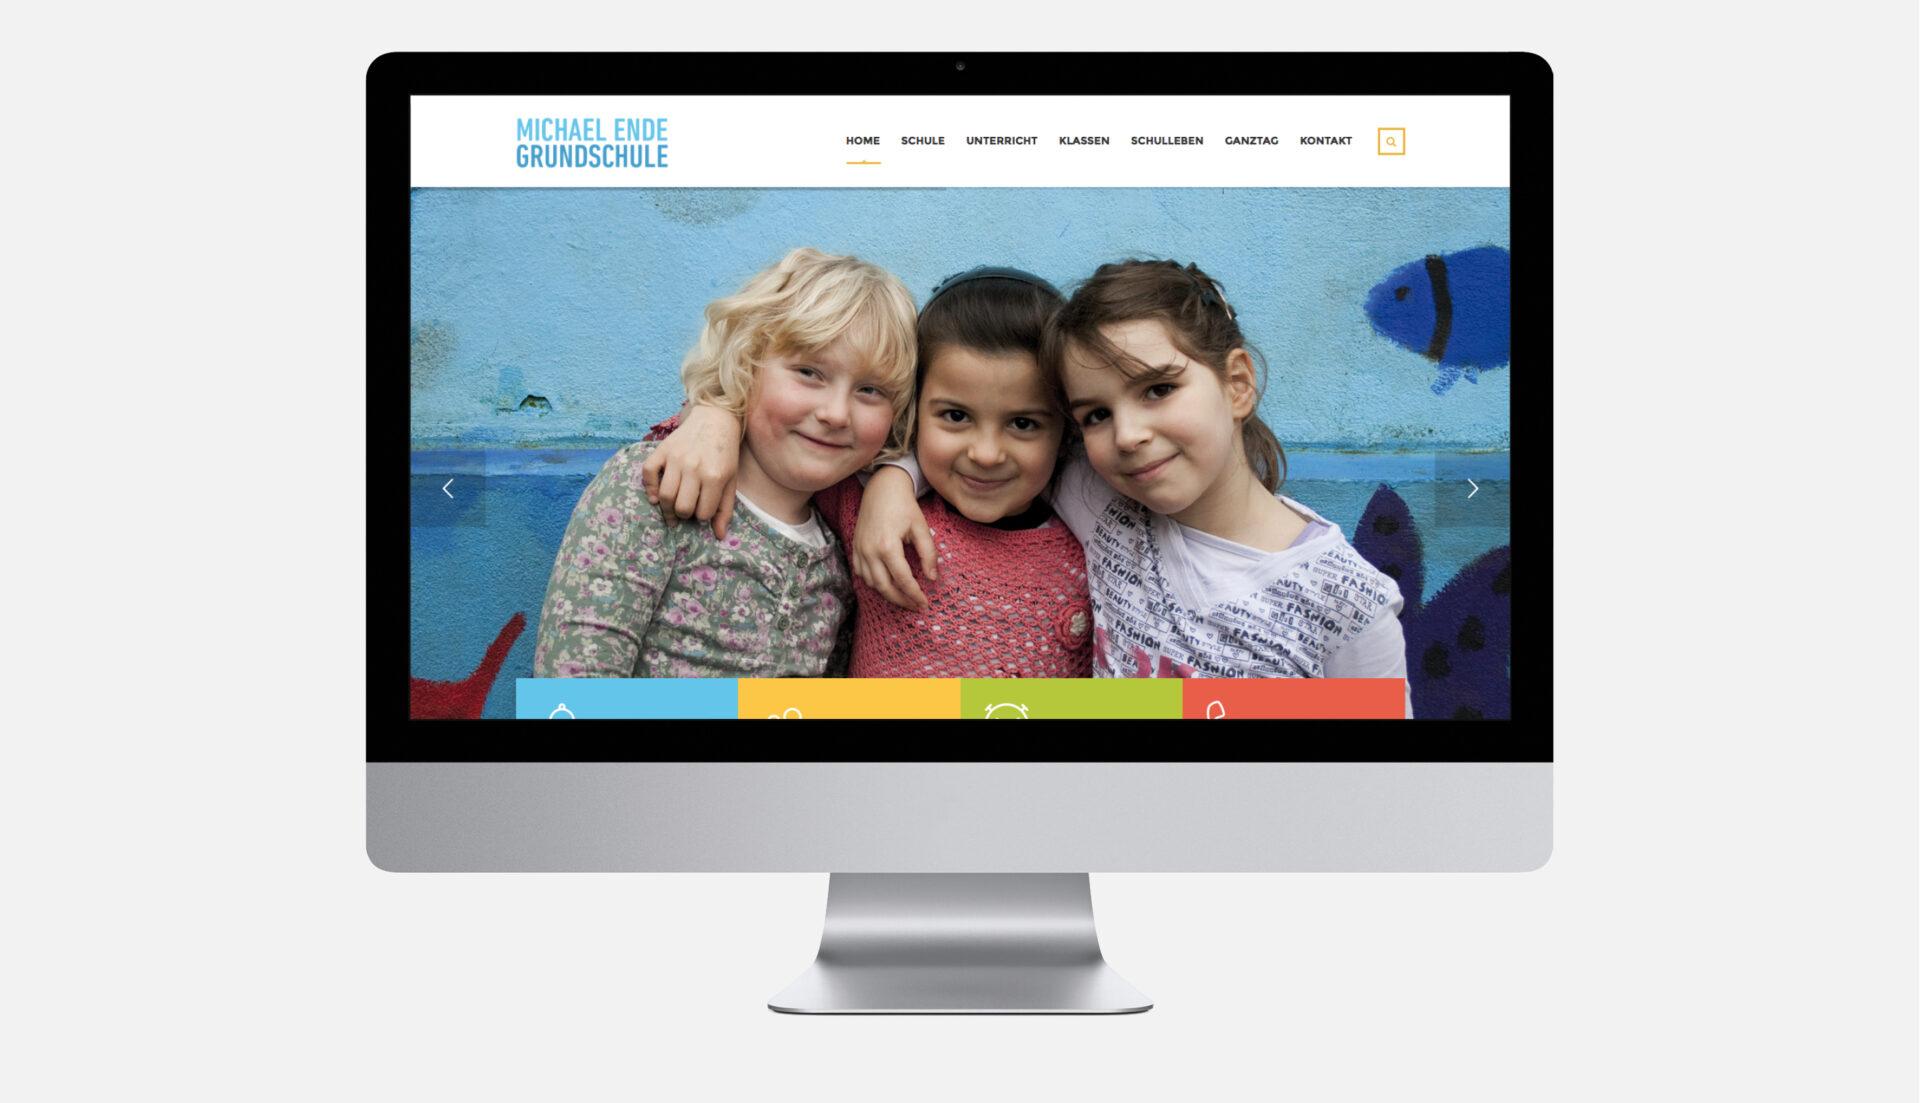 Michael-Ende-Grundschule – Website